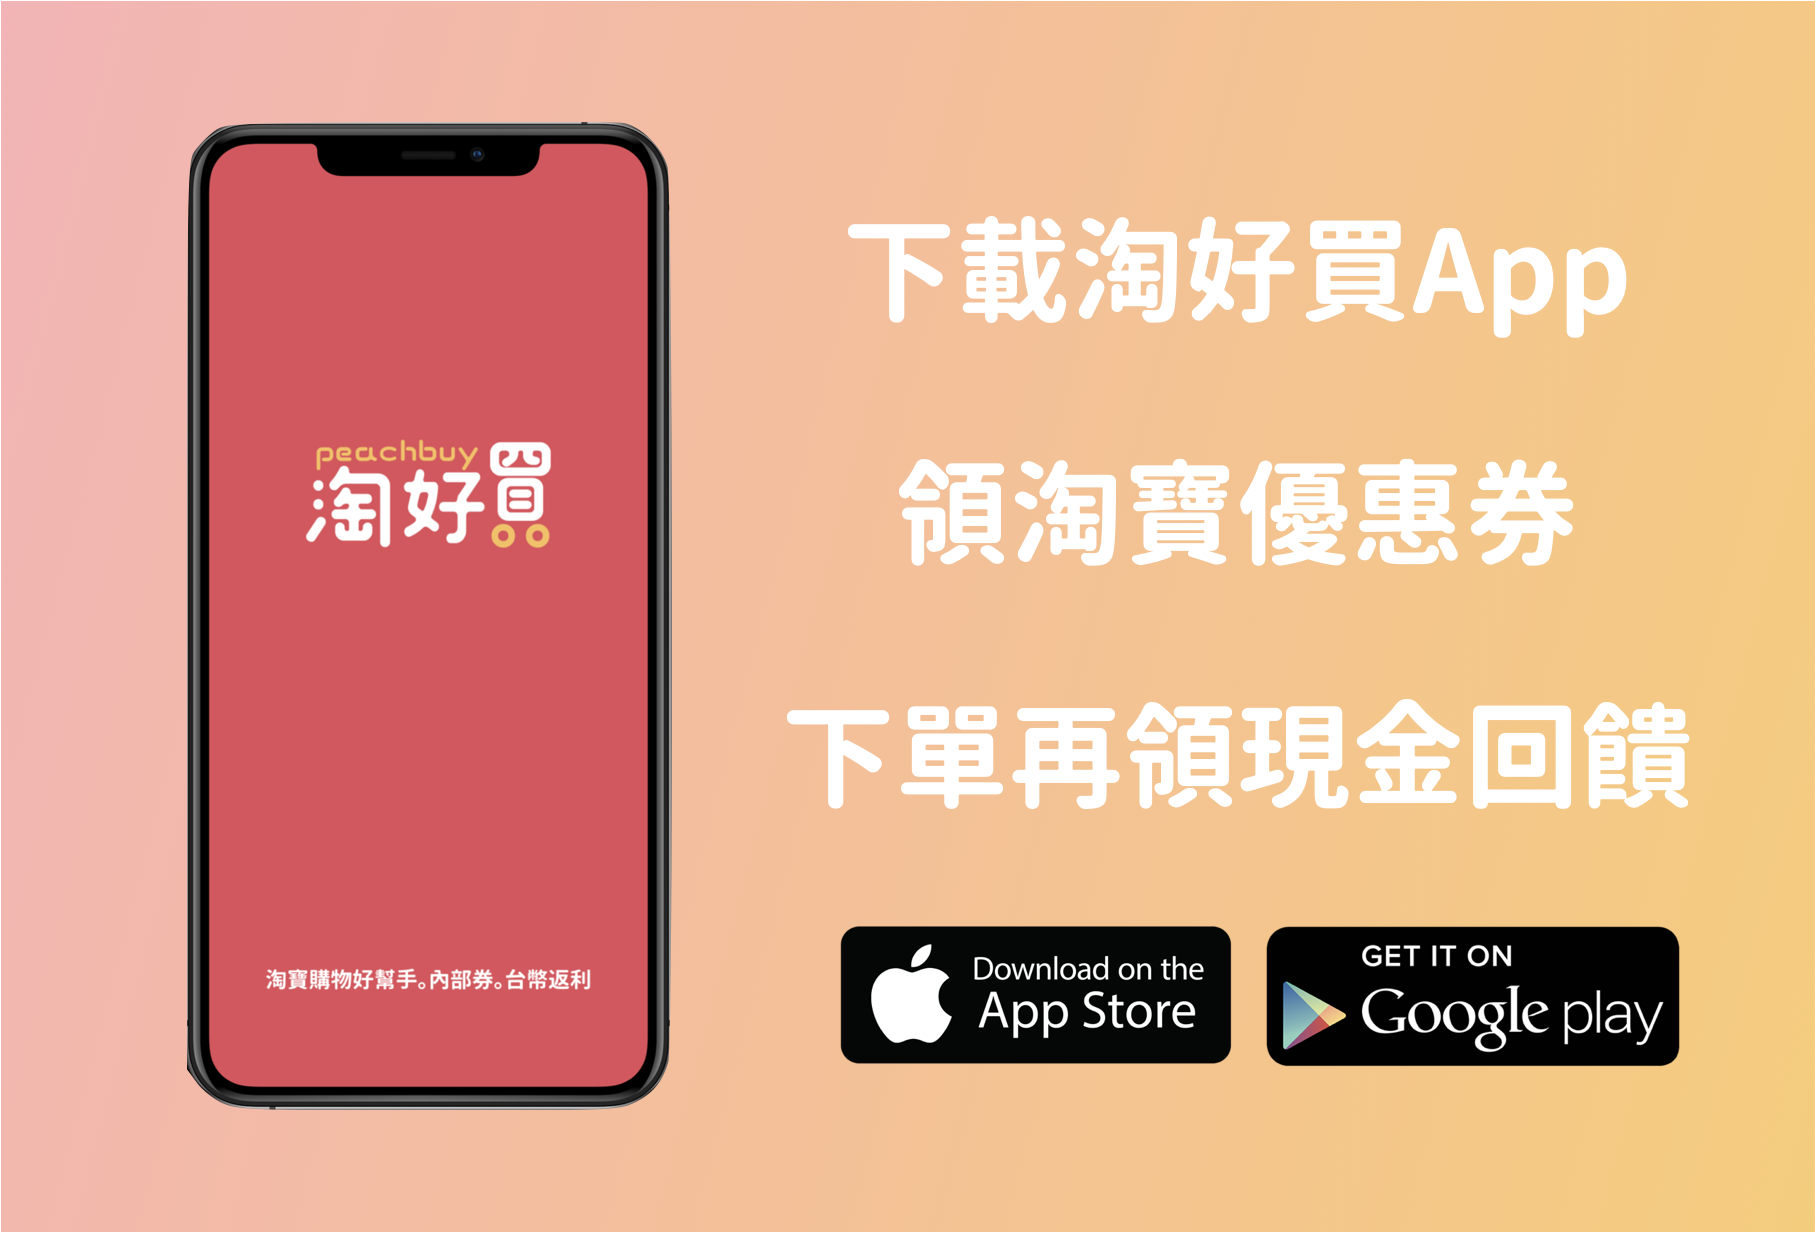 peachbuy app